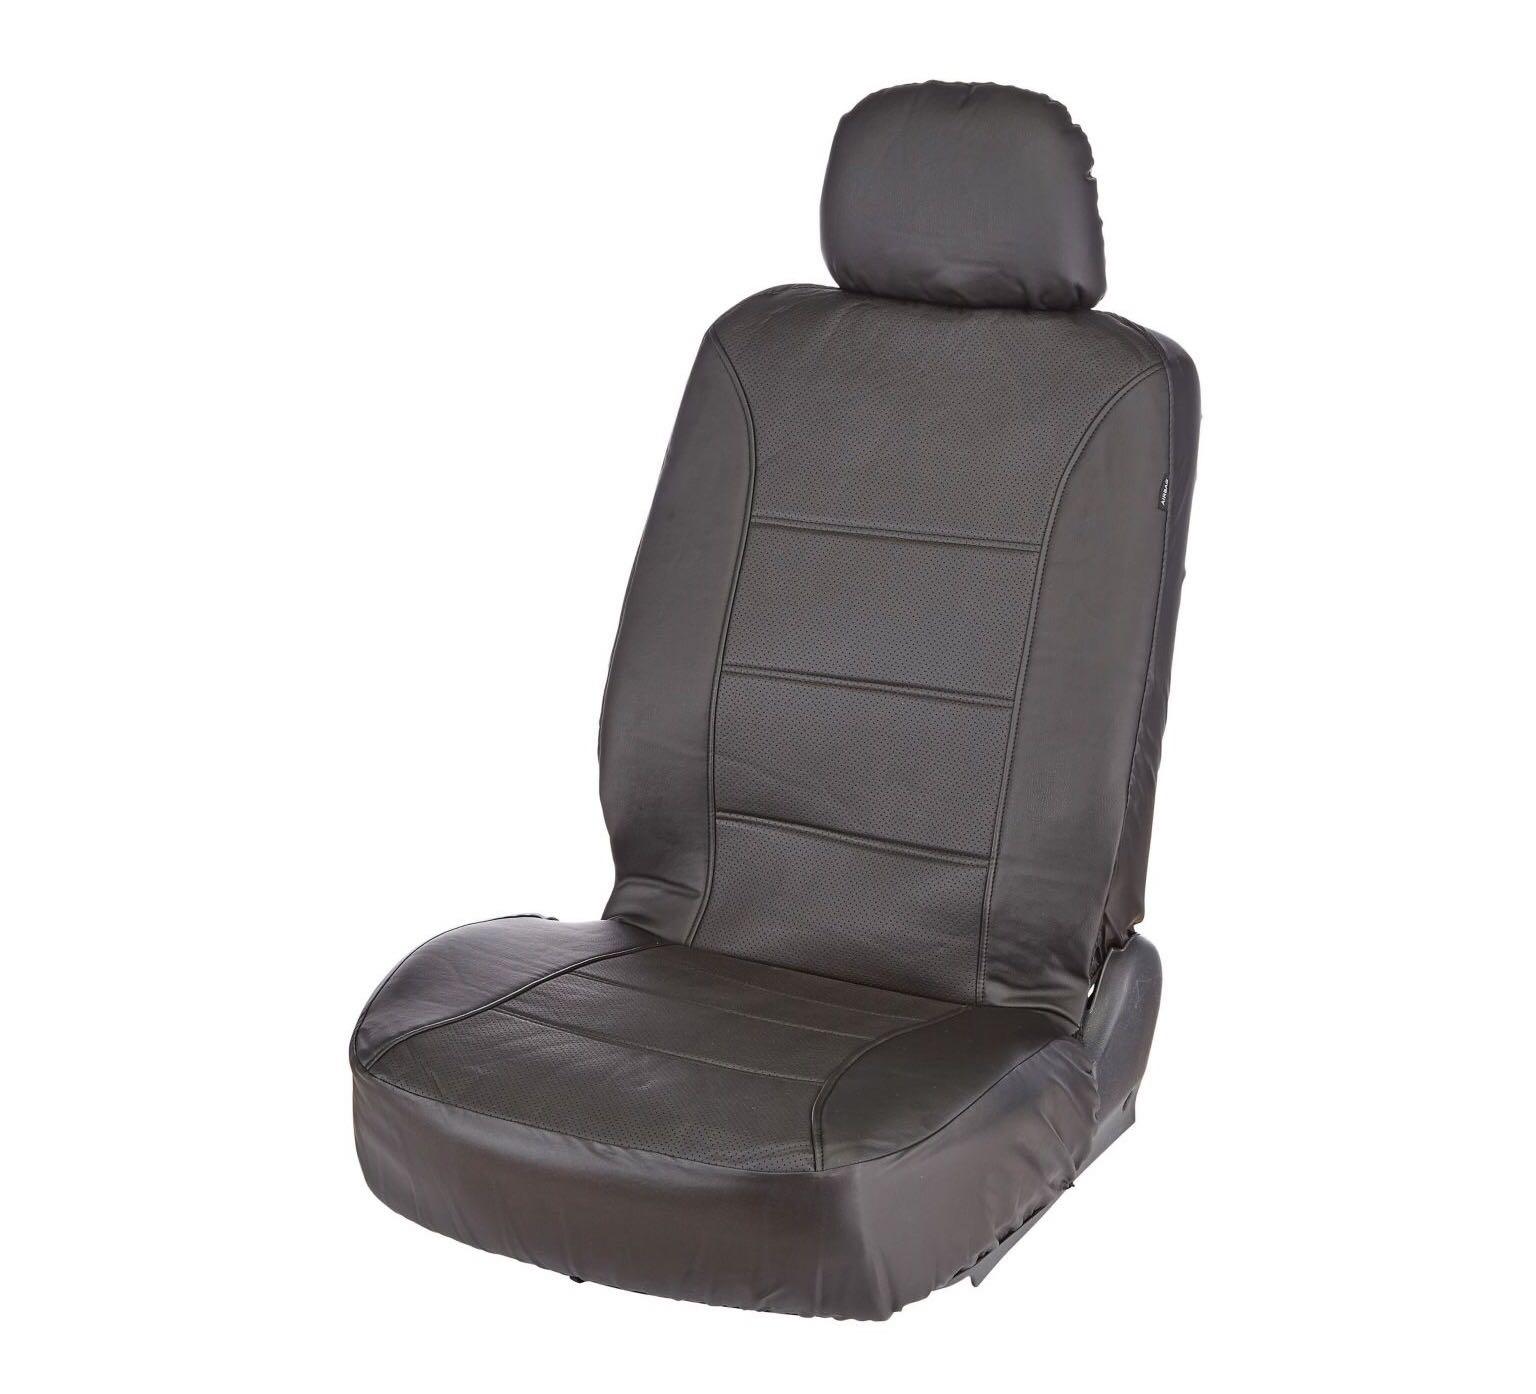 2 black universal seat covers